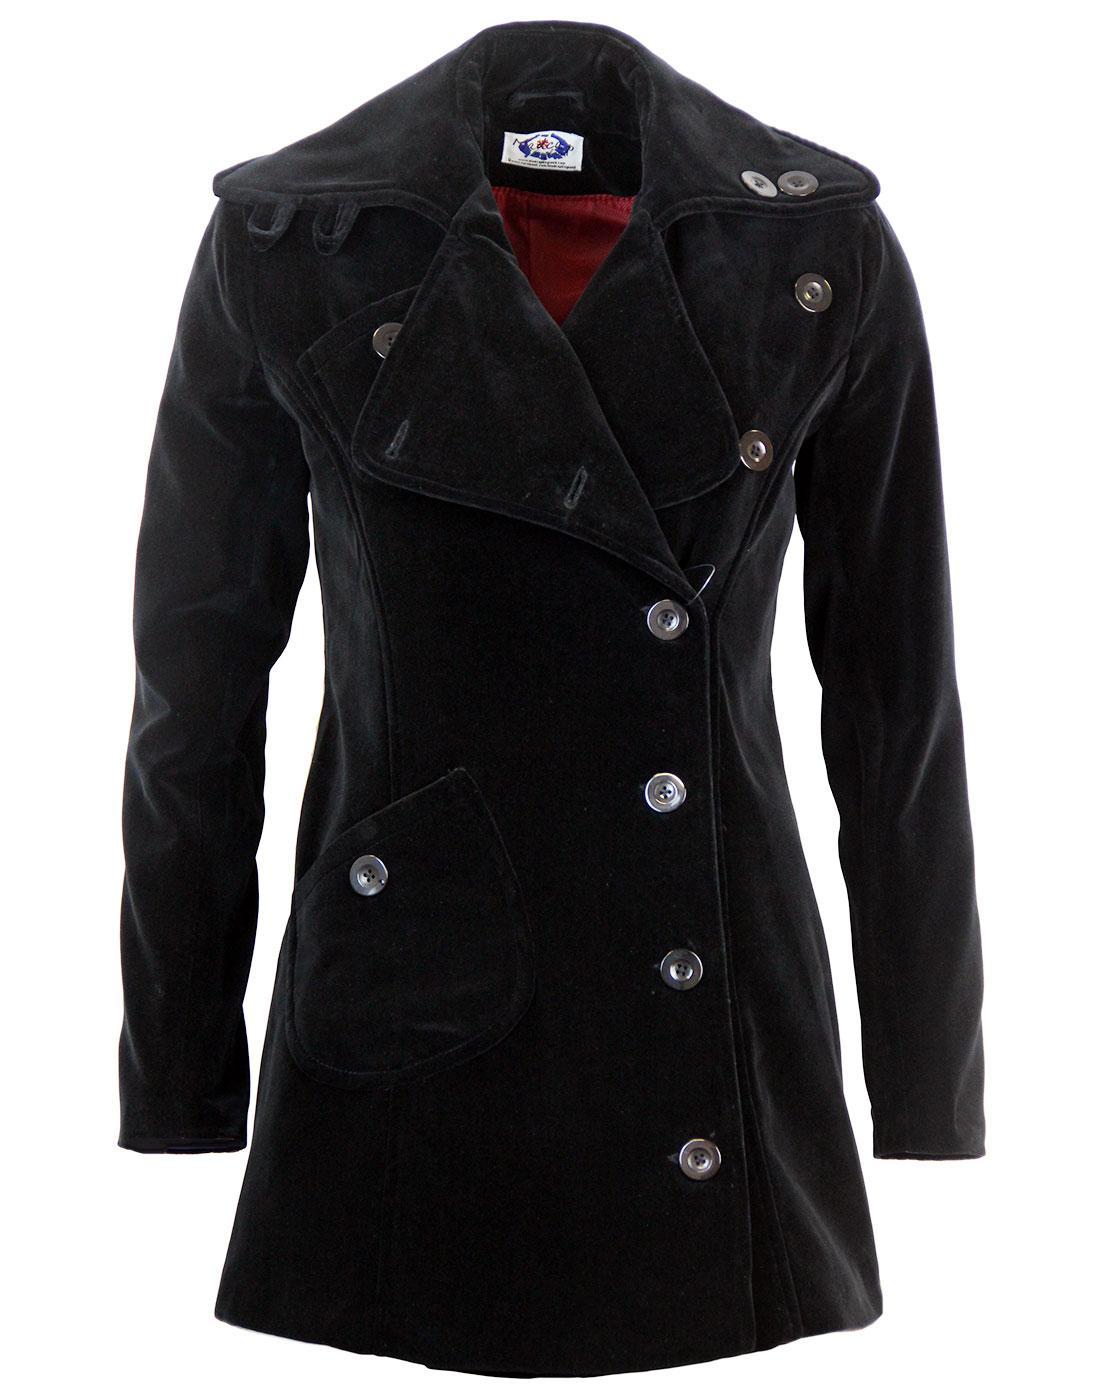 Velvet Grace MADCAP ENGLAND Vintage 60s Style Coat